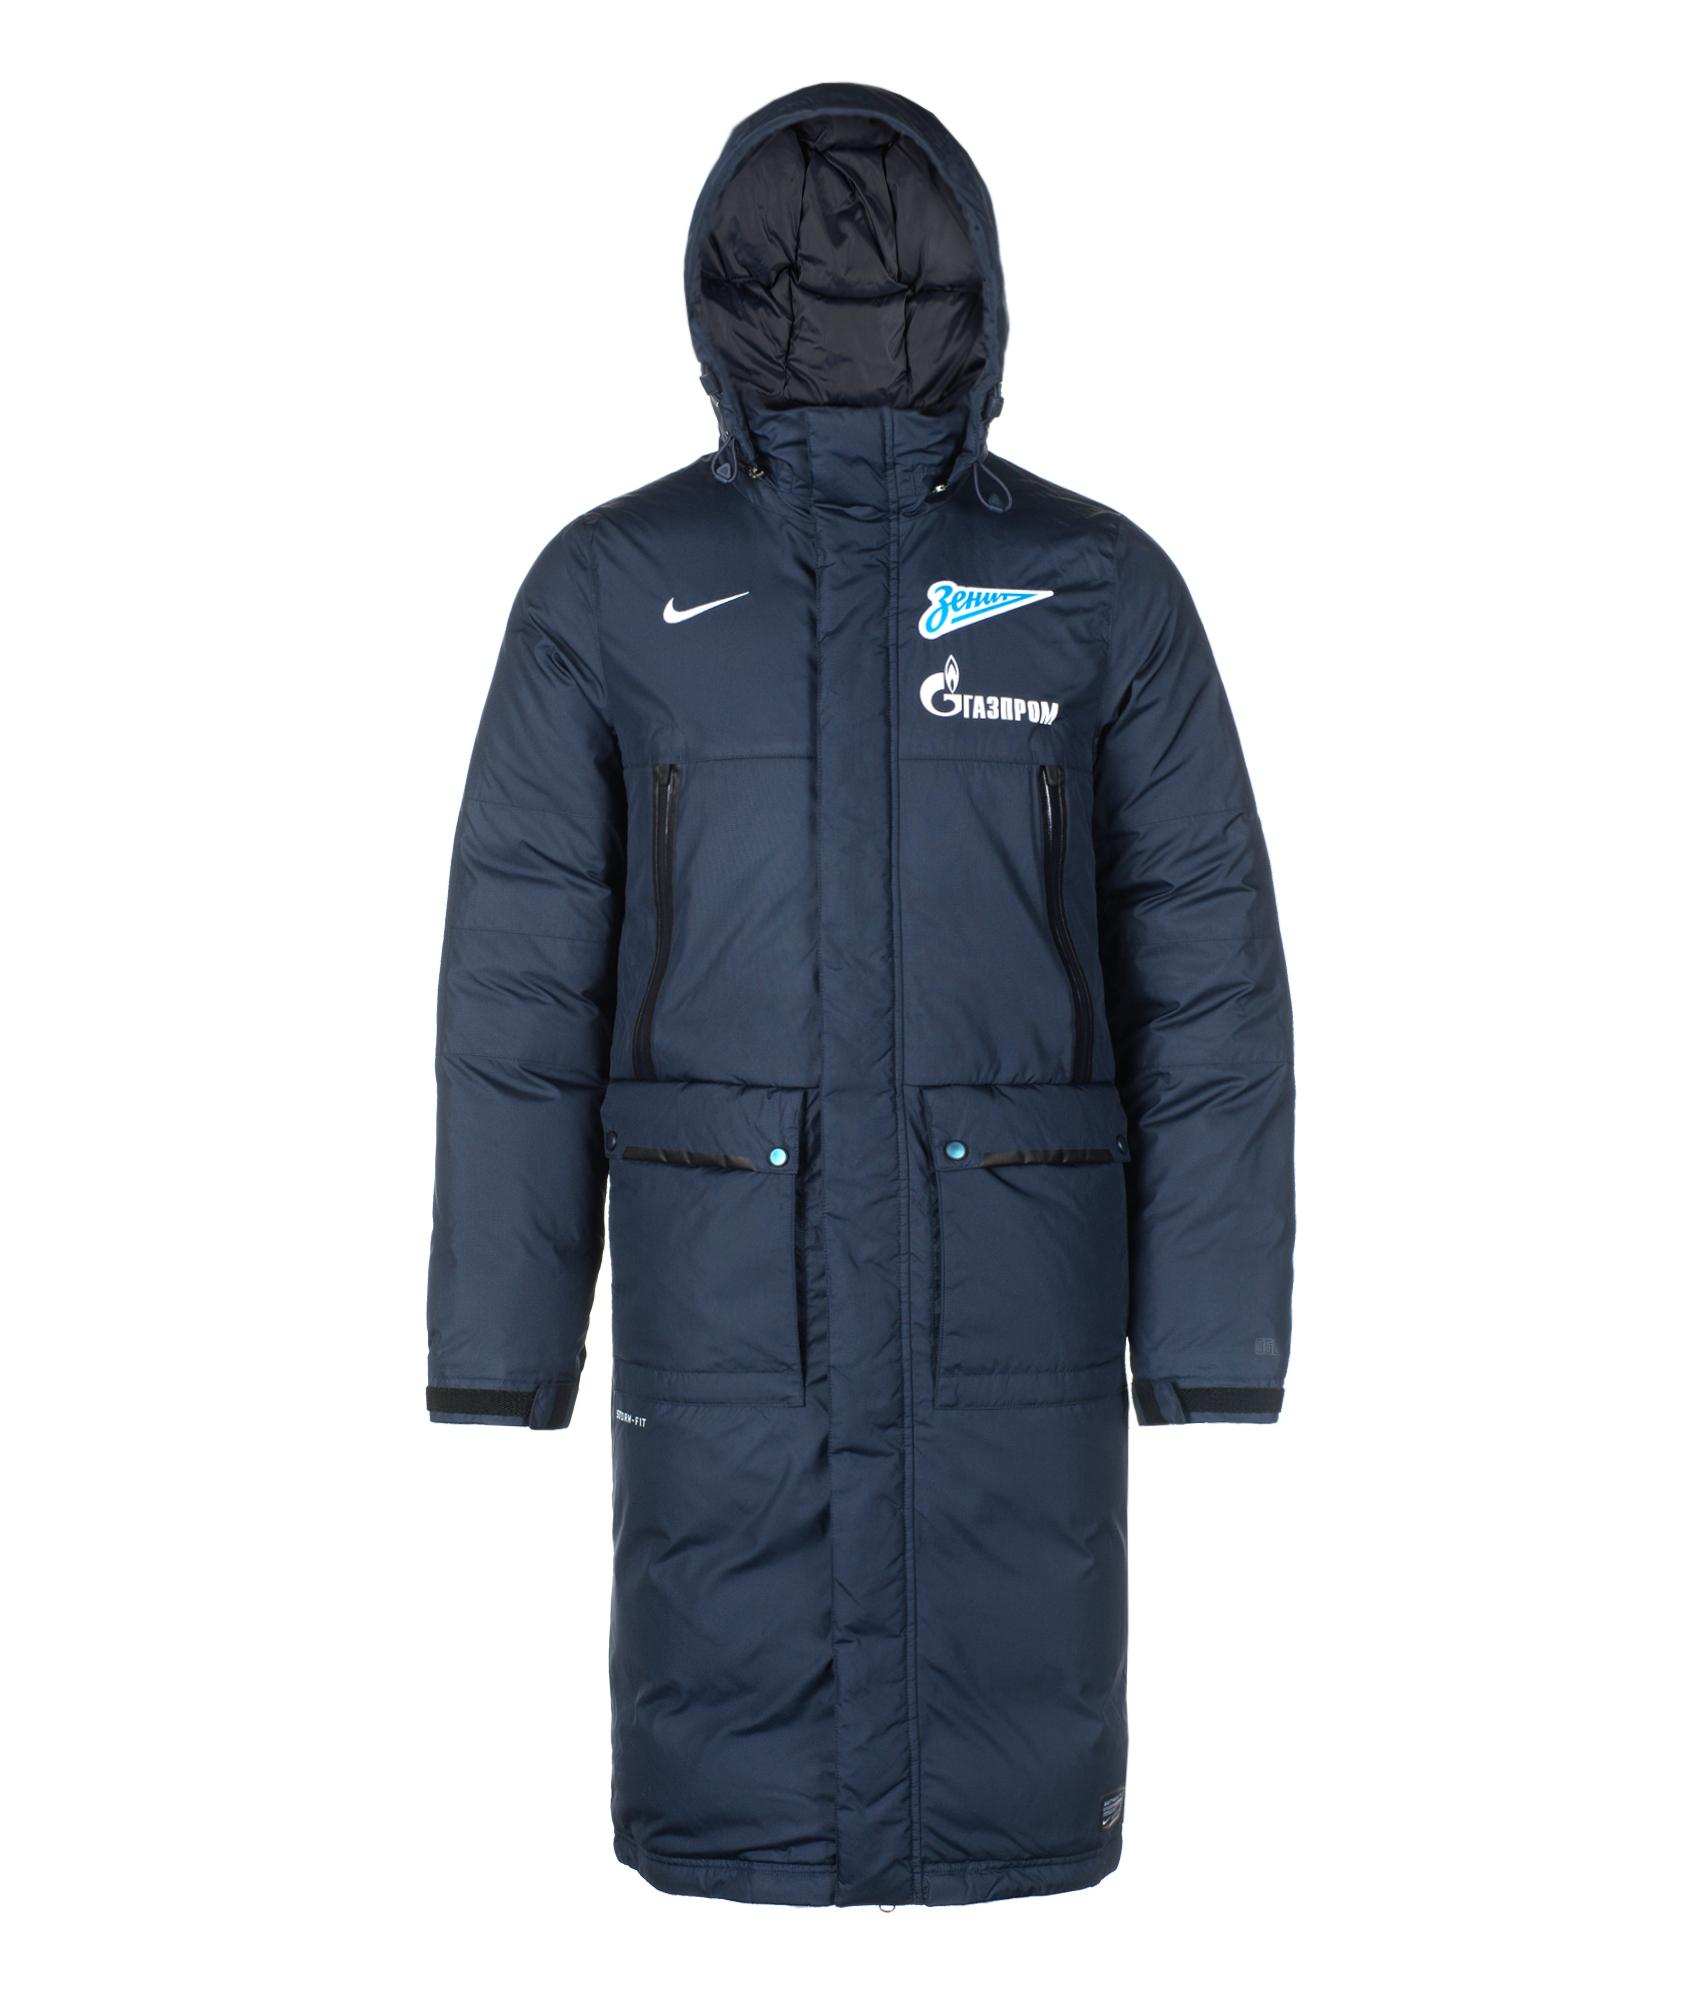 Пуховик удлиненный Nike ZENIT SELECT DOWN LGR JKT, Цвет-Синий, Размер-S